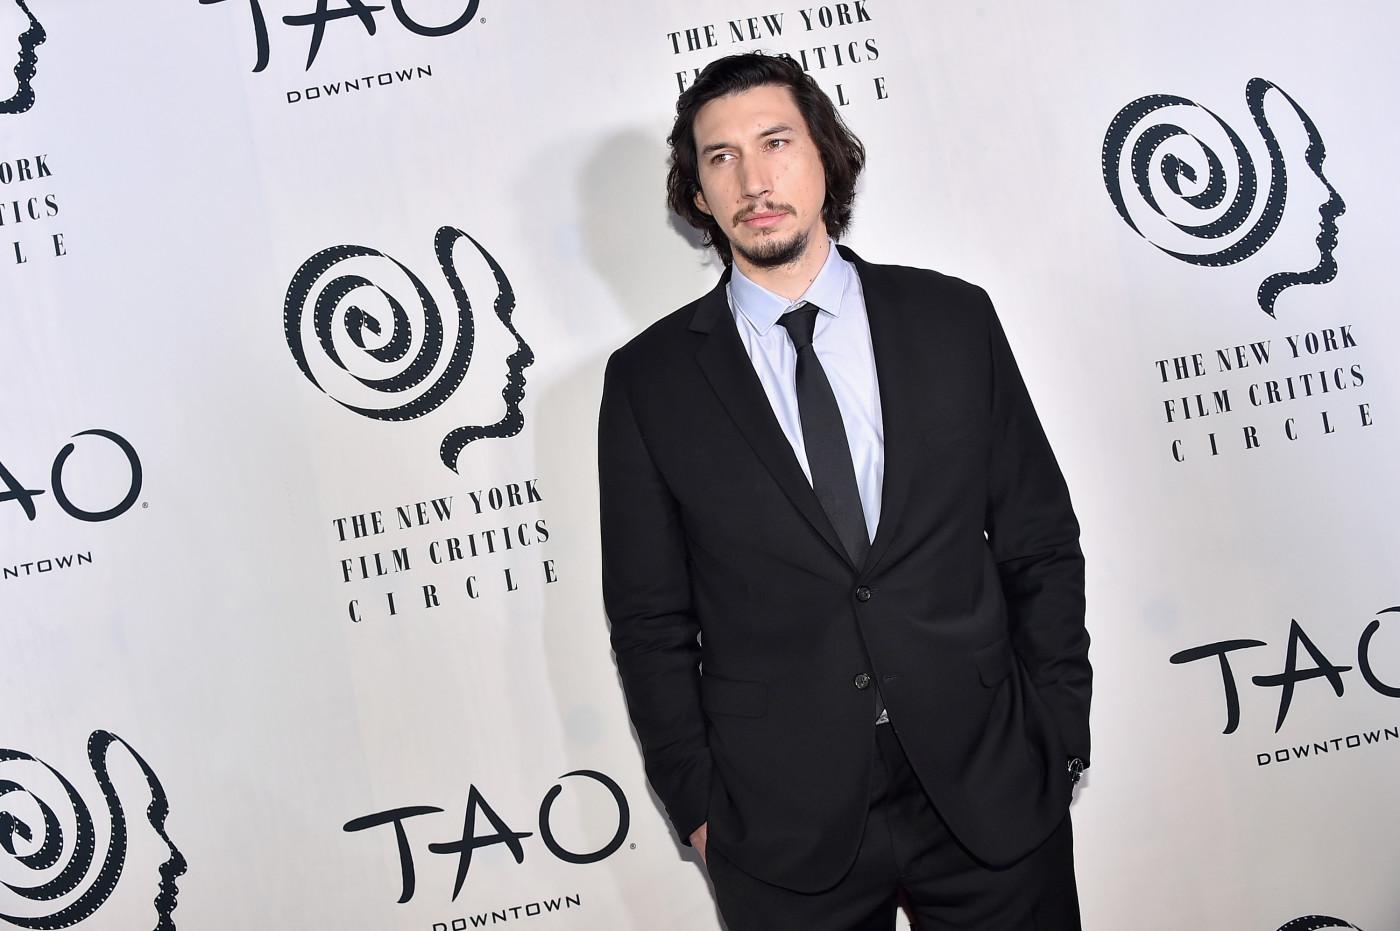 Adam Driver attends the 2016 New York Film Critics Circle Awards